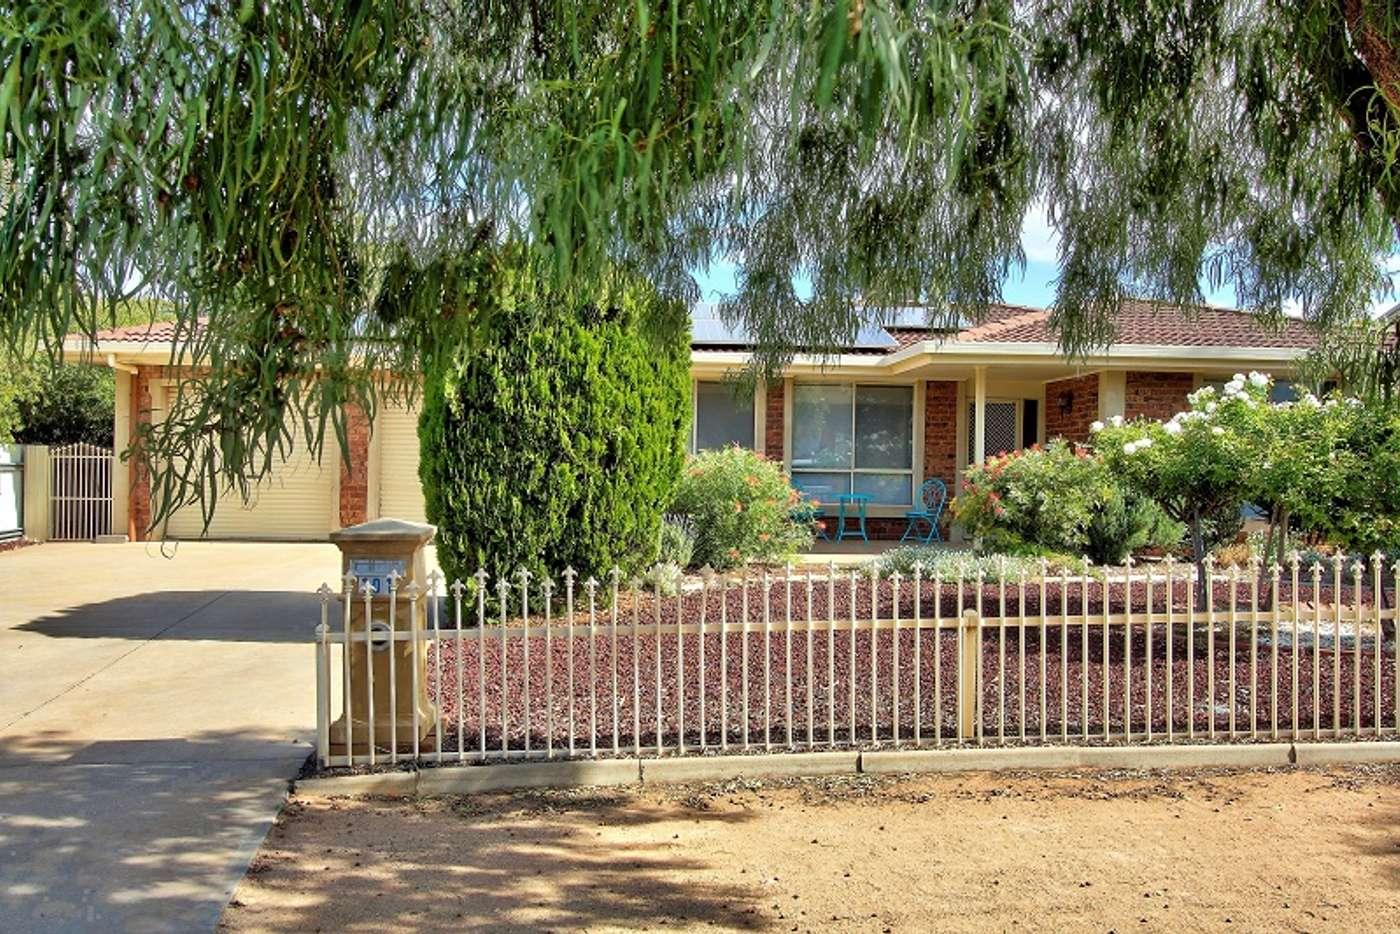 Main view of Homely house listing, 101 Kay Avenue, Berri SA 5343